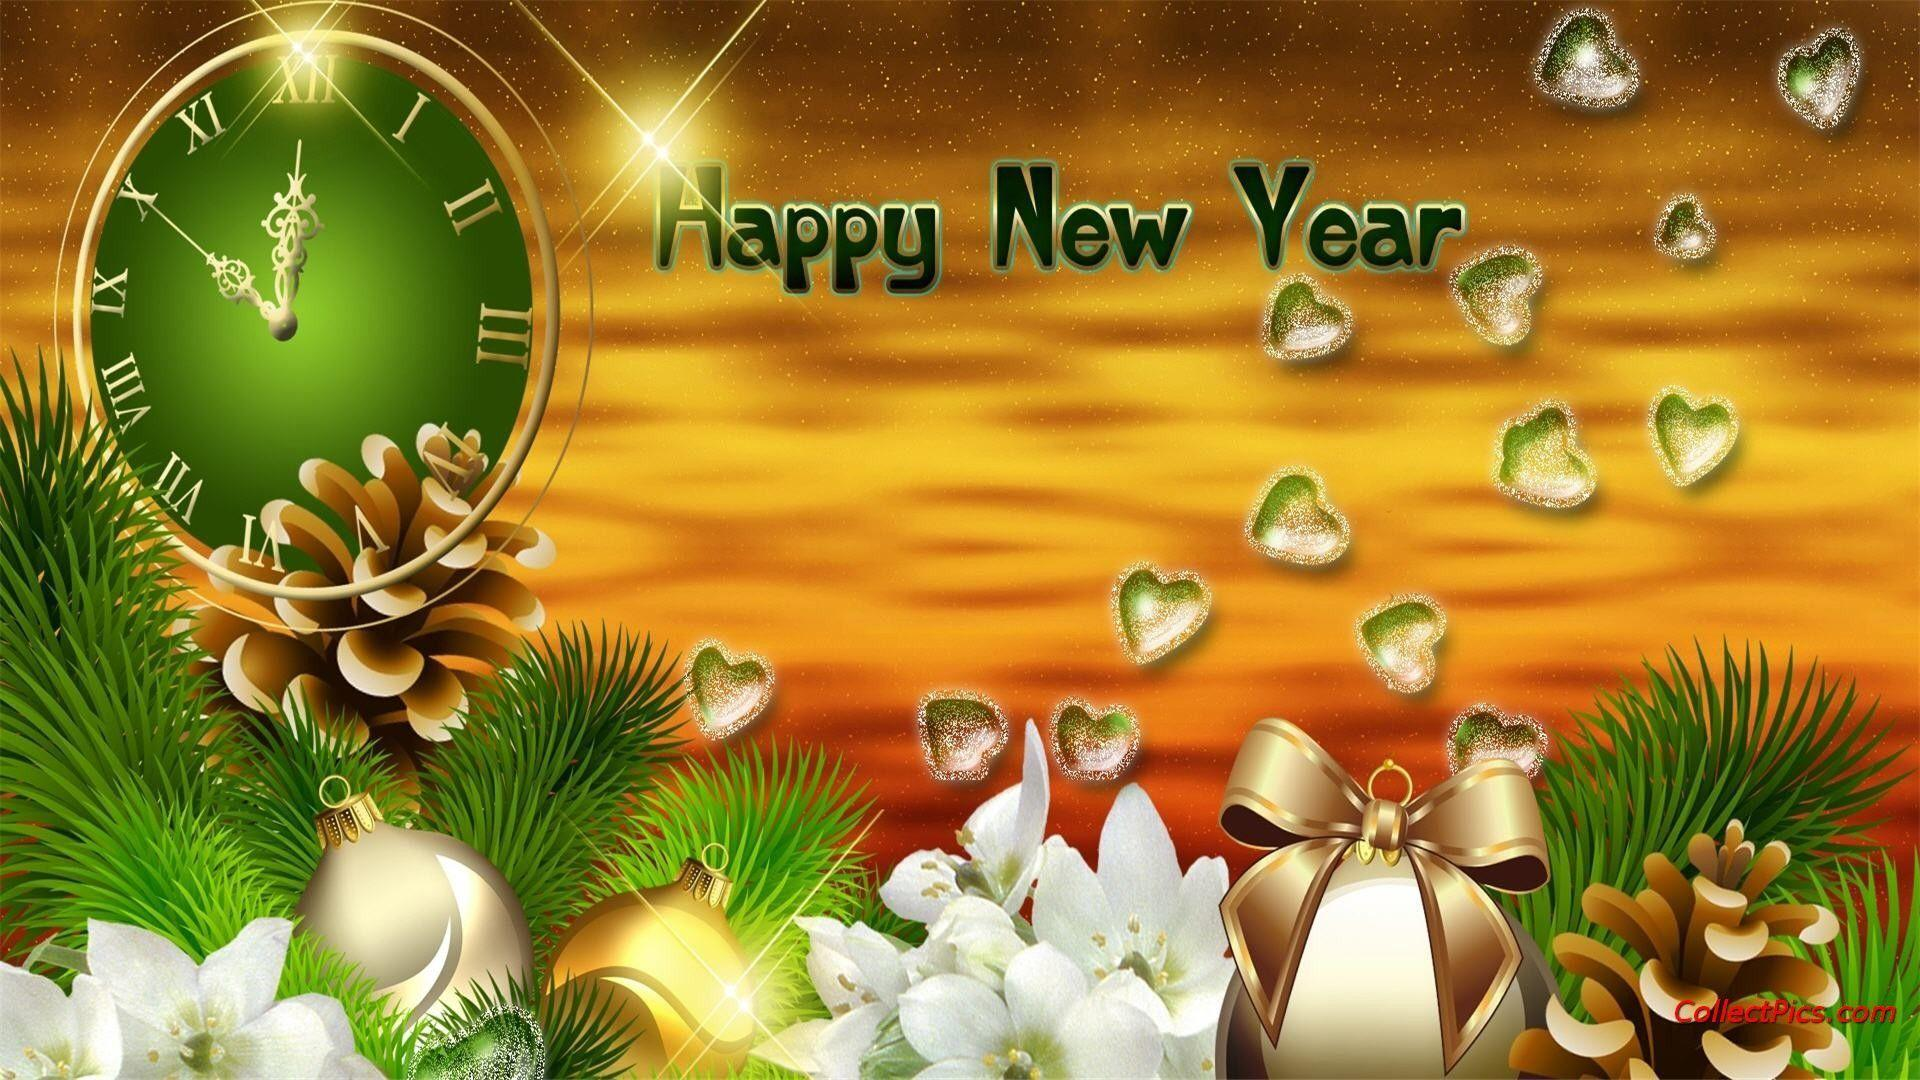 Happy New Year Stylish Photo